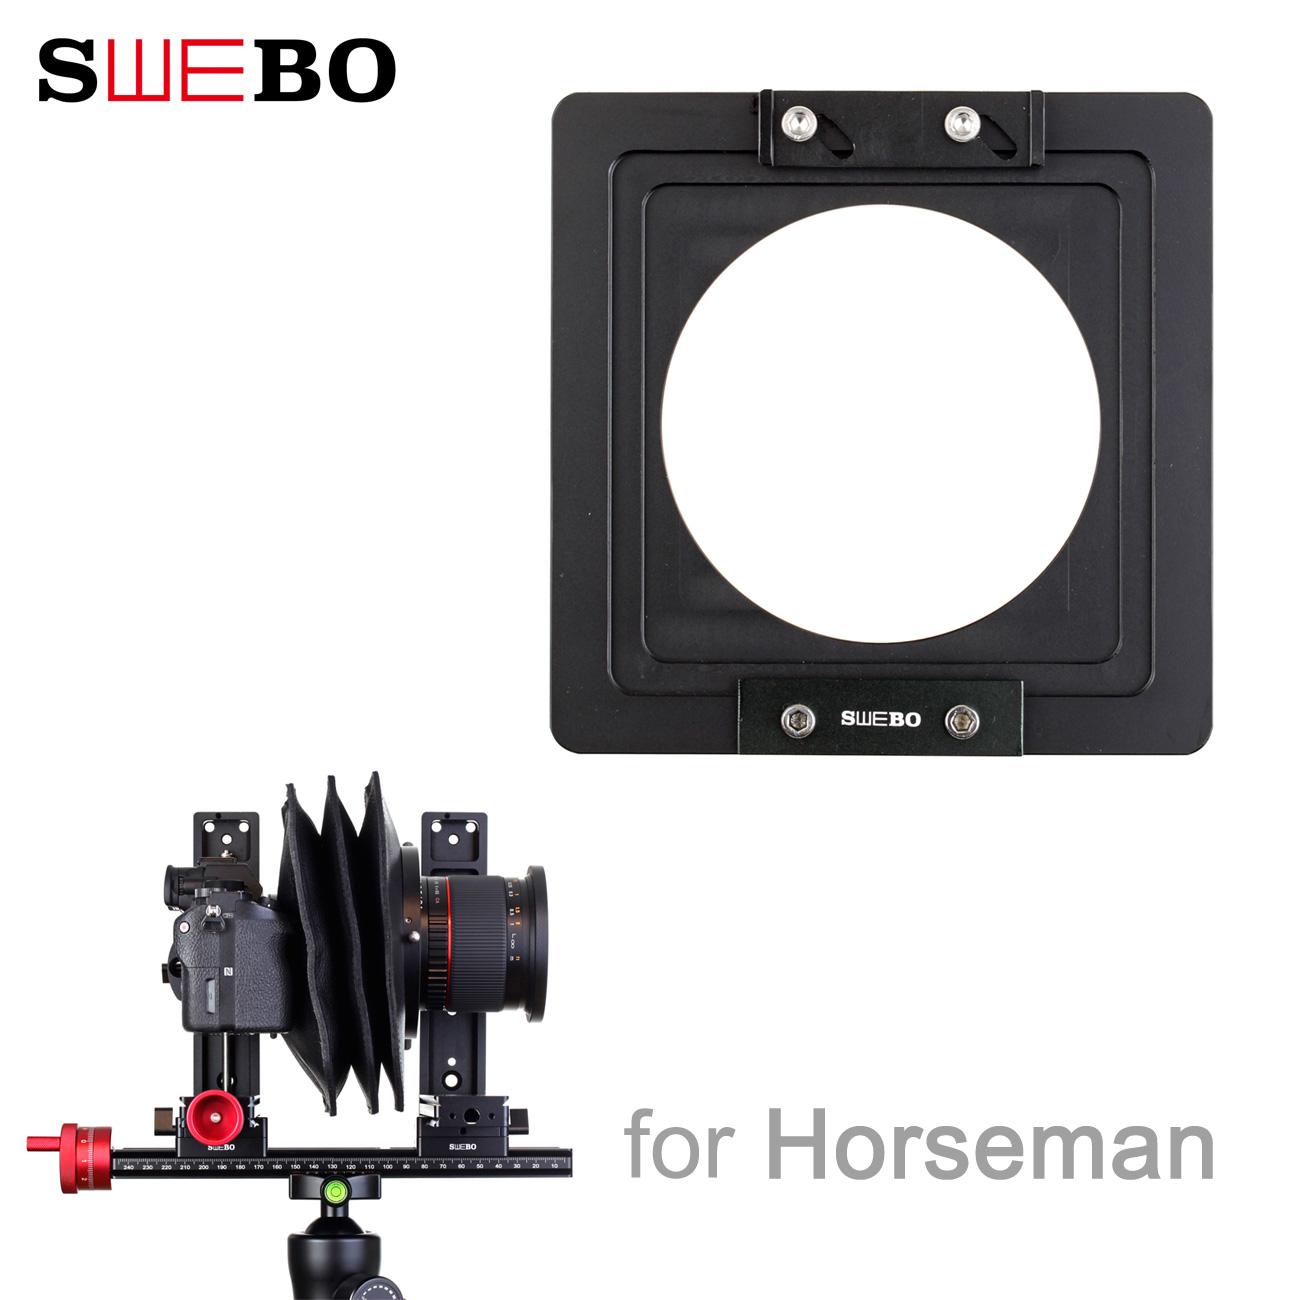 Swebo micro monorail Knight 80mm lens board adapter